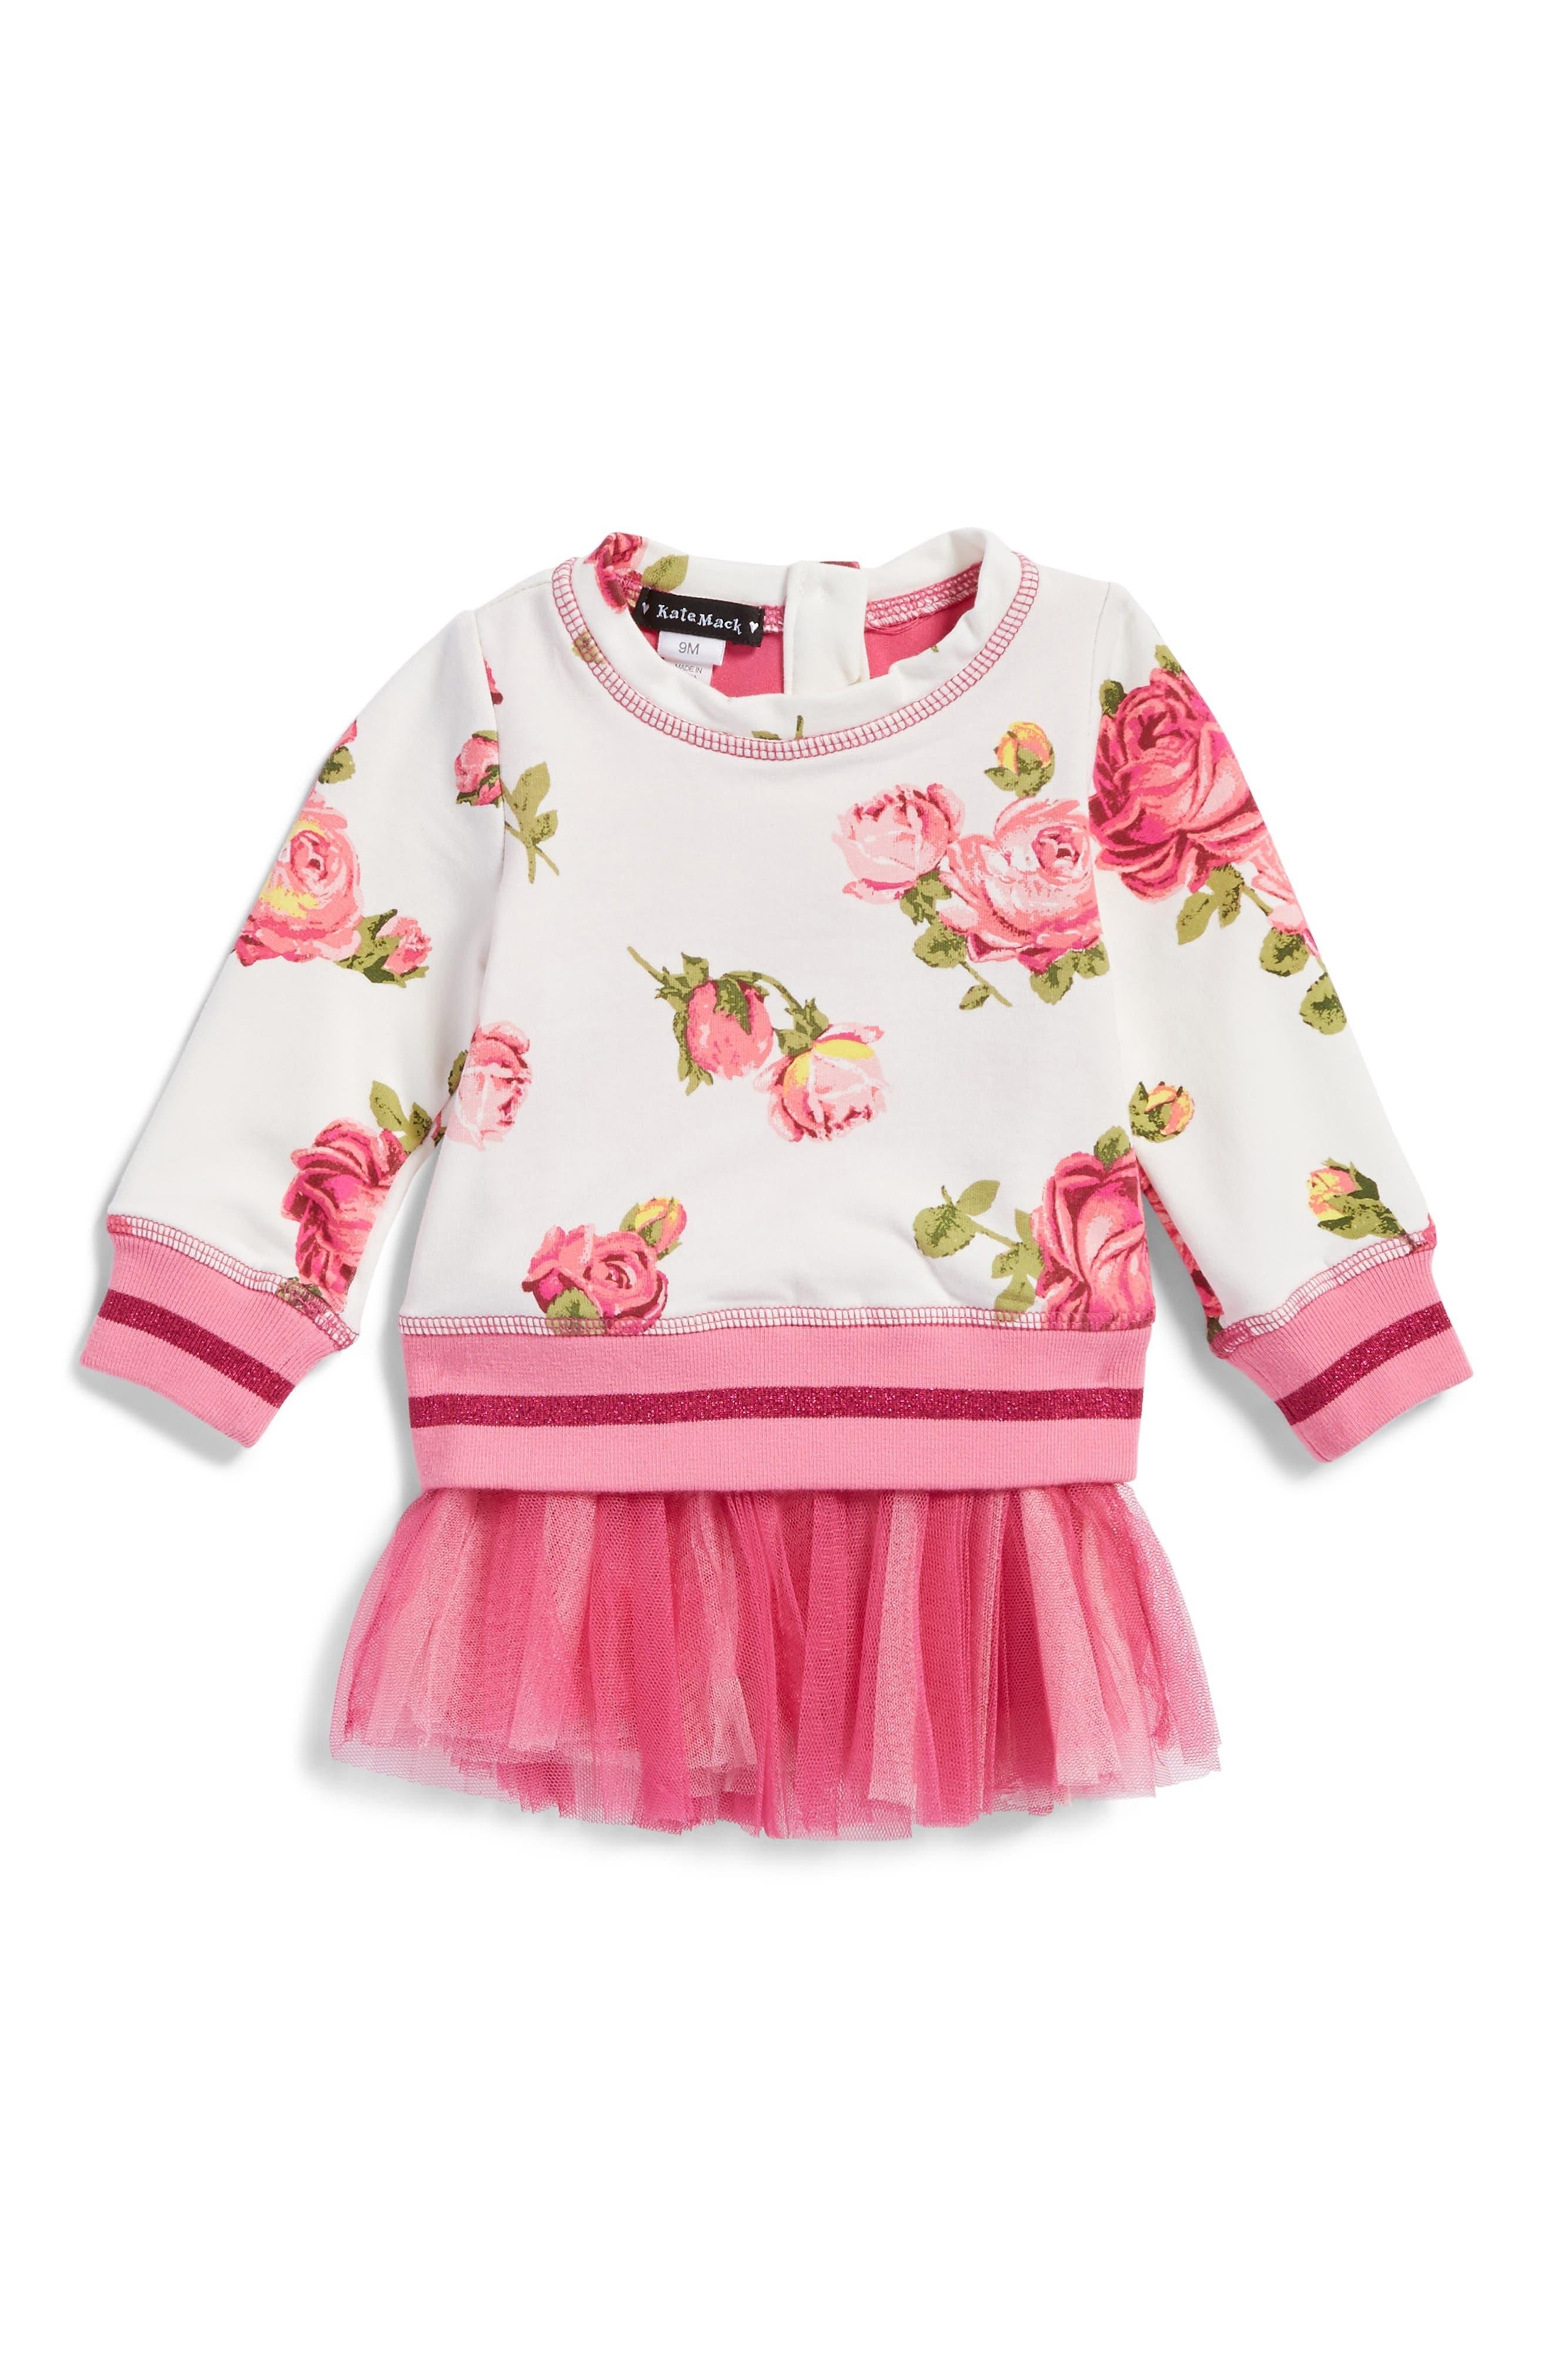 Alternate Image 1 Selected - Kate Mack Floral Print Sweatshirt Tutu Dress (Baby Girls)